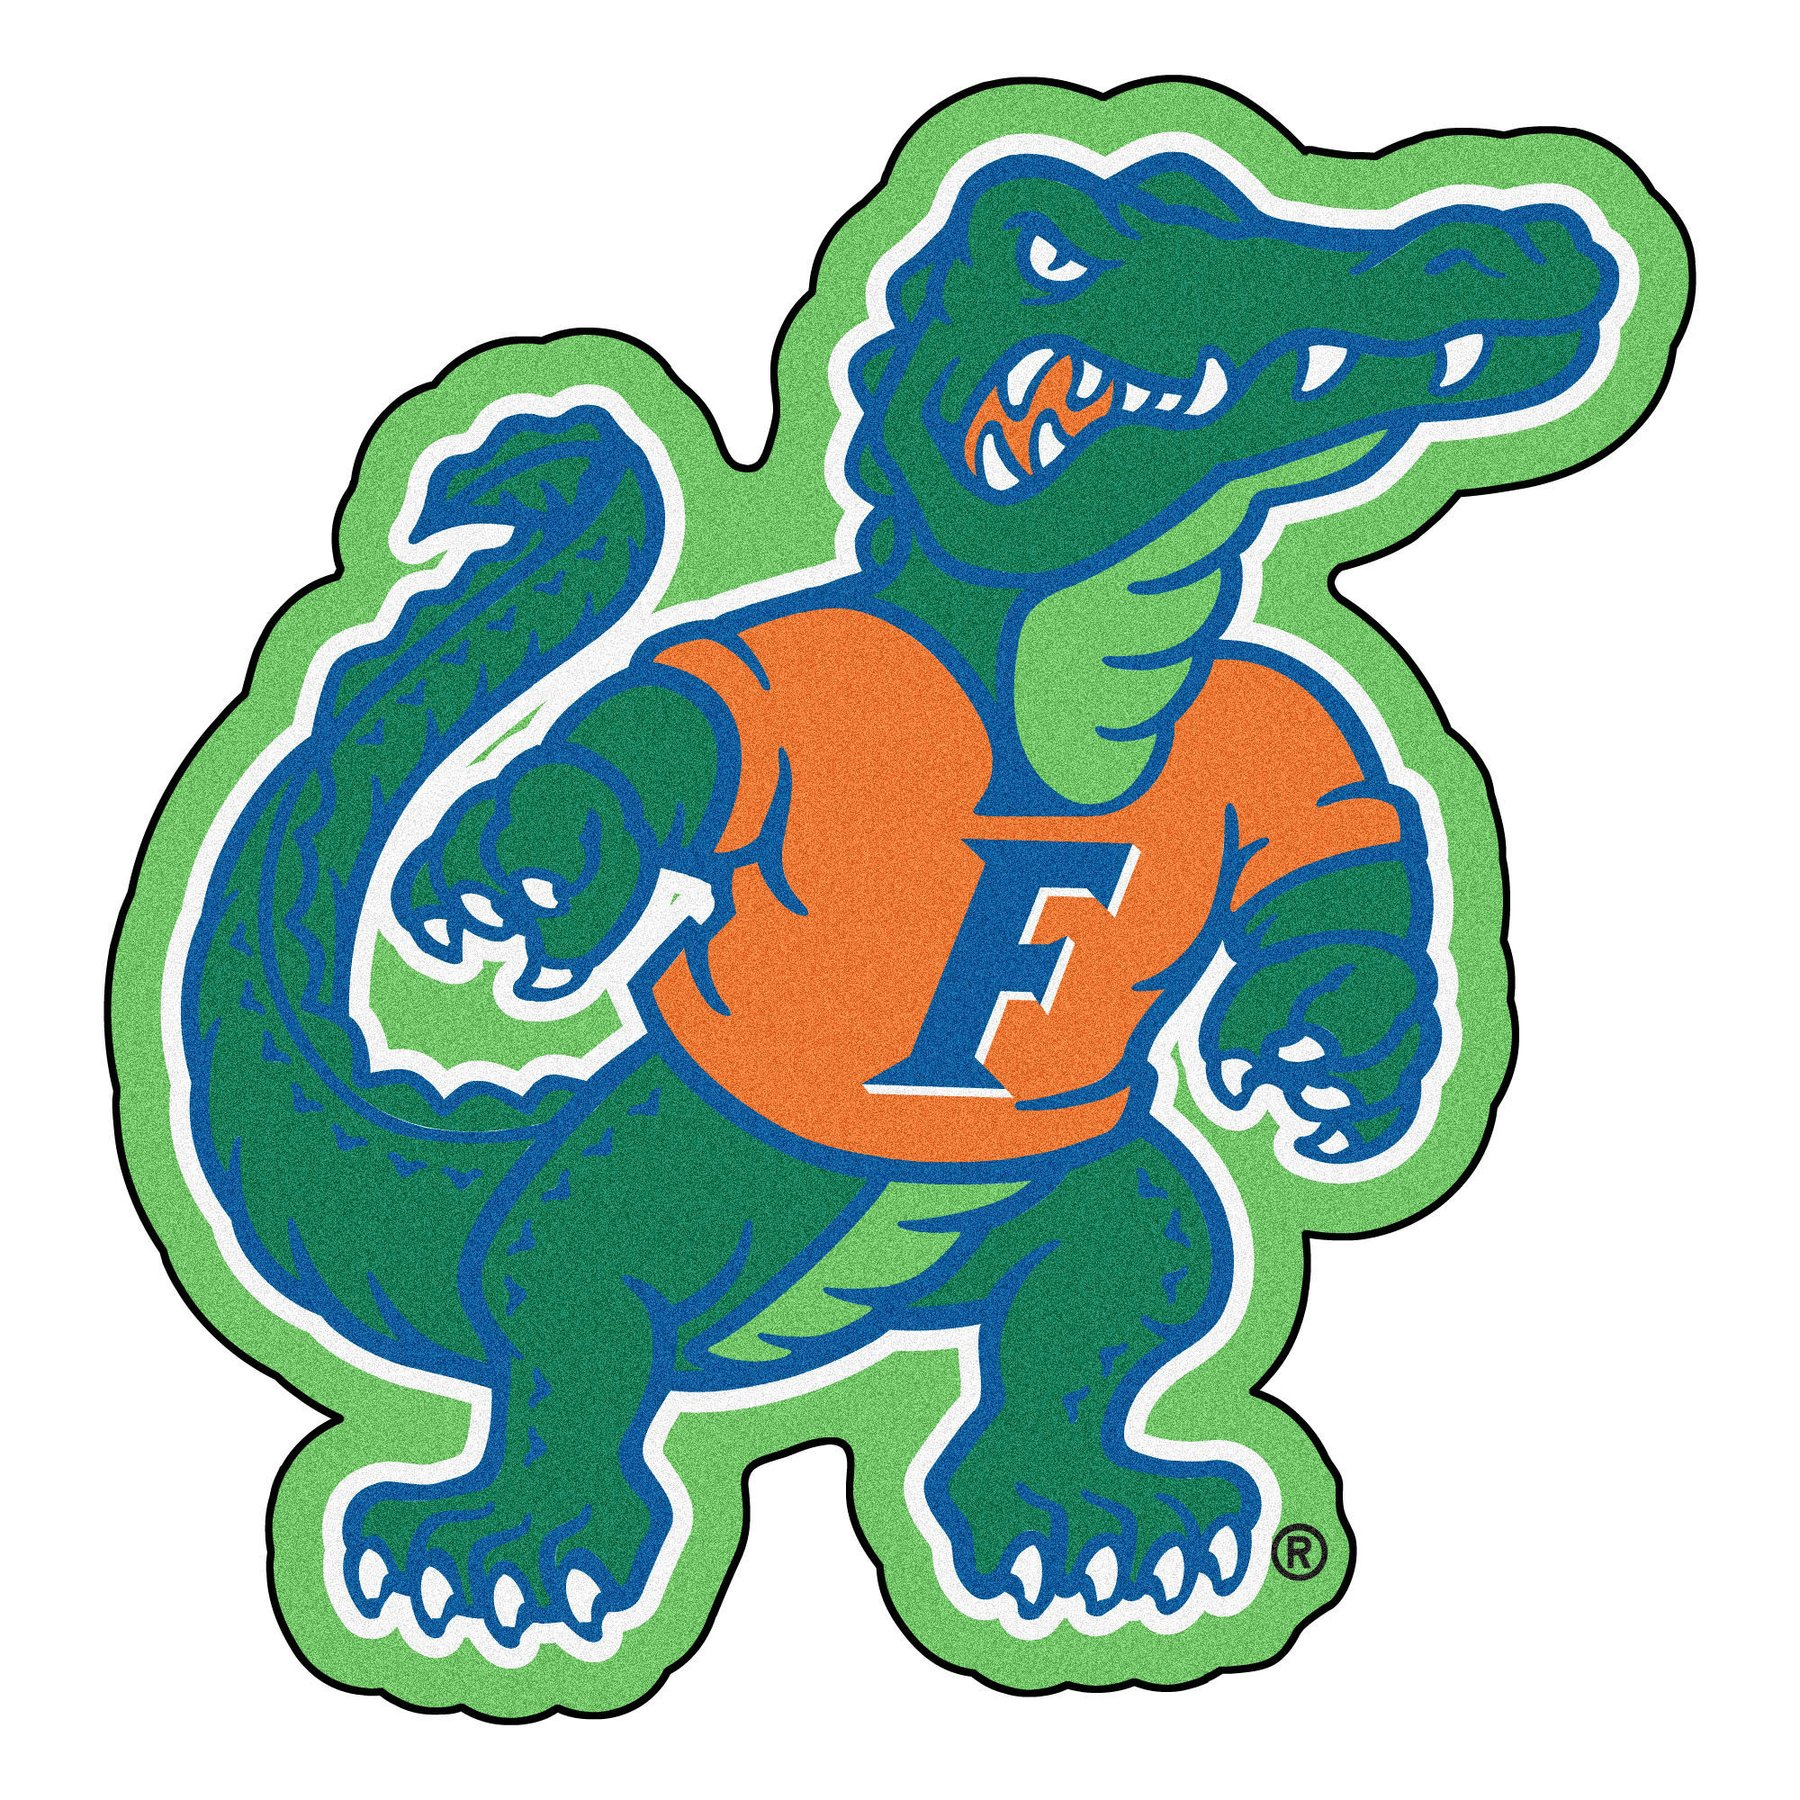 1800x1800 University Of Florida Gators Mascot Area Rug Zokee